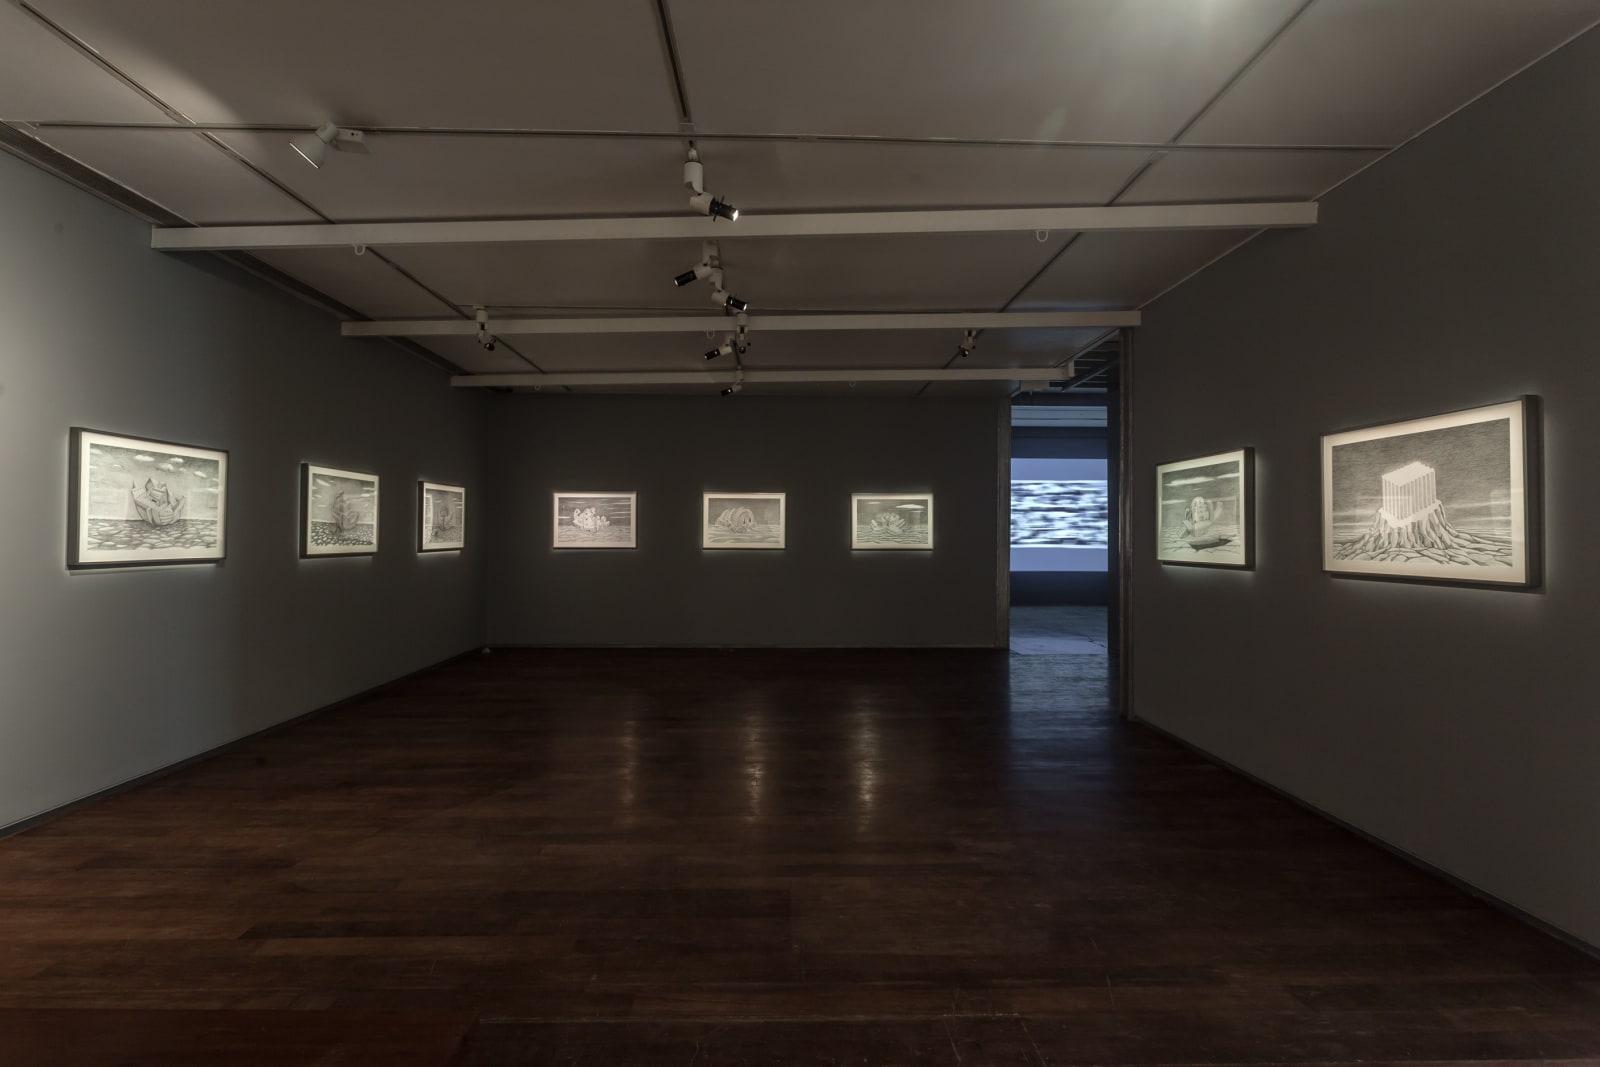 Gigi Scaria, The Ark, display view, 2015